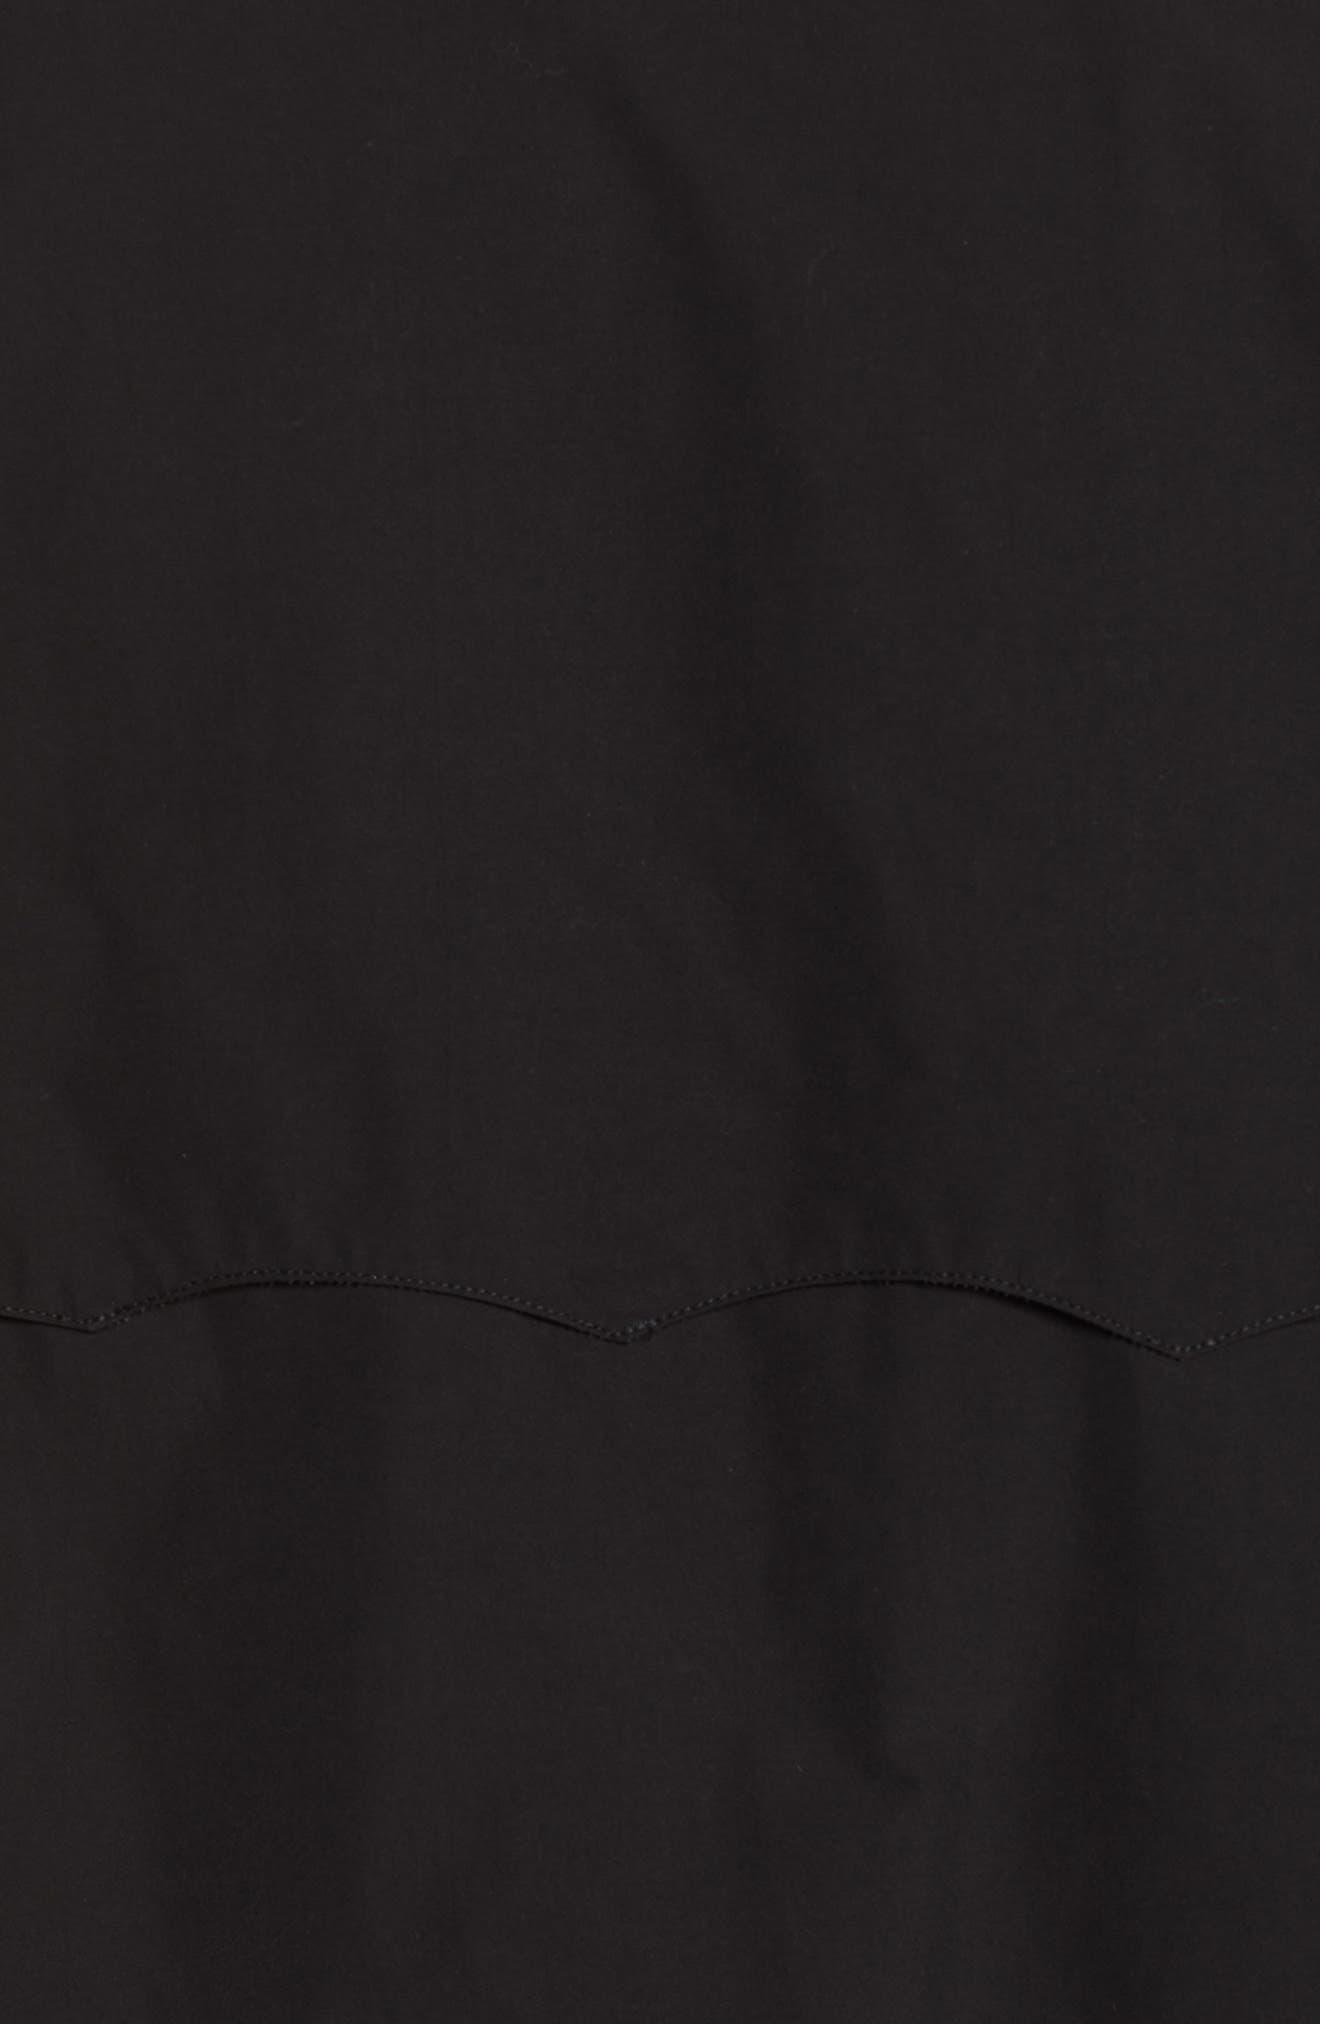 G9 Water Resistant Harrington Jacket,                             Alternate thumbnail 7, color,                             BLACK